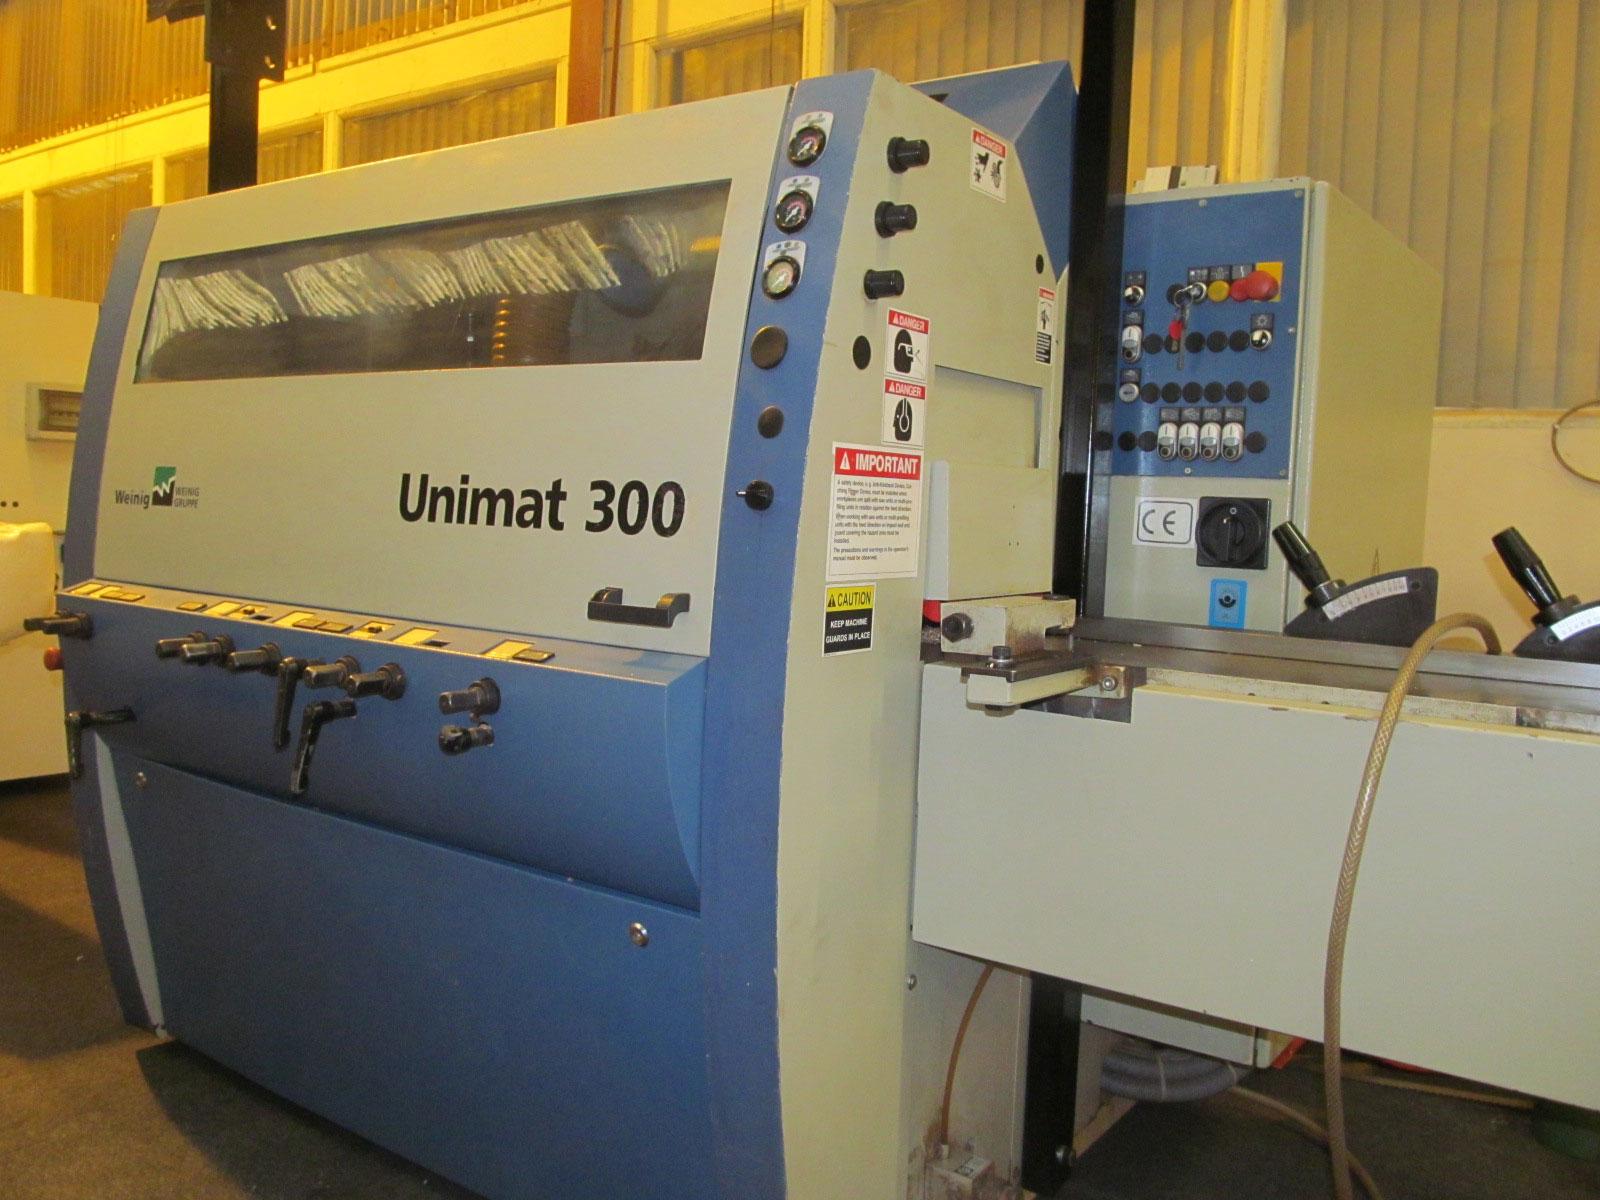 Weinig Unimat 300 5 head moulder - Woodworking - CNC